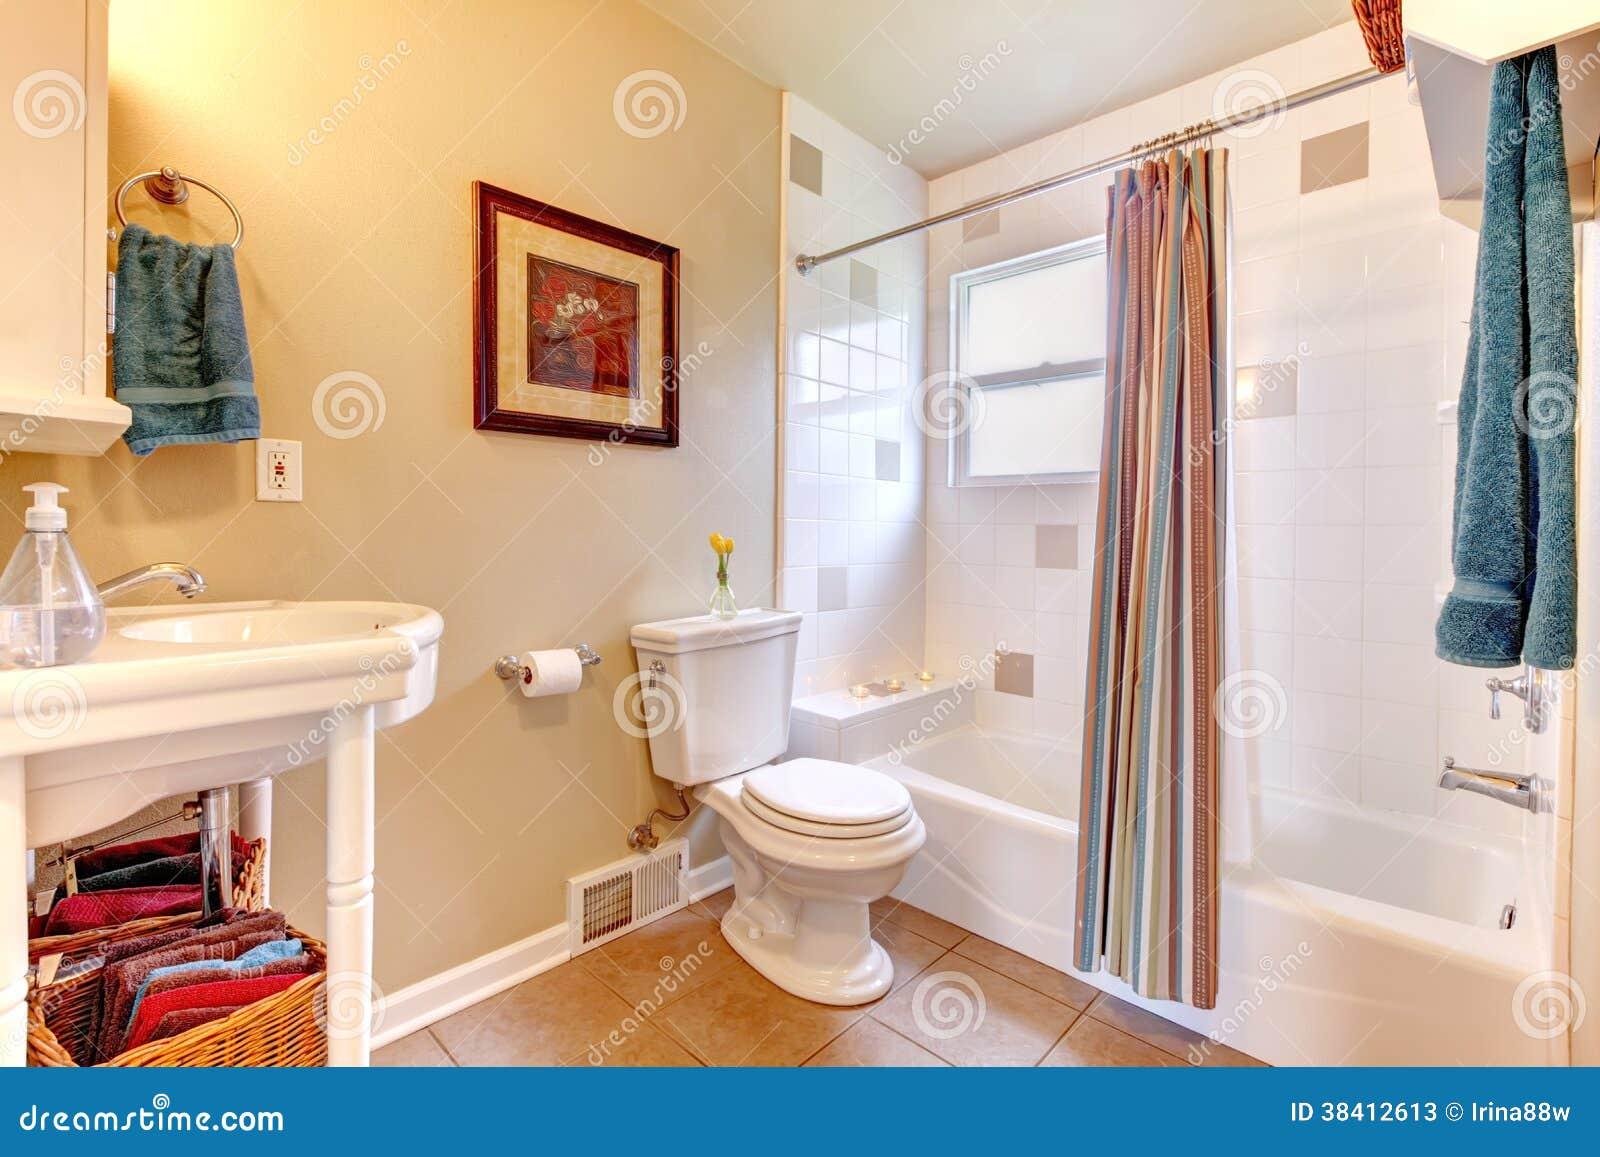 verfrissende badkamers met witte ton en beige tegelvloer stock foto 39 s afbeelding 38412613